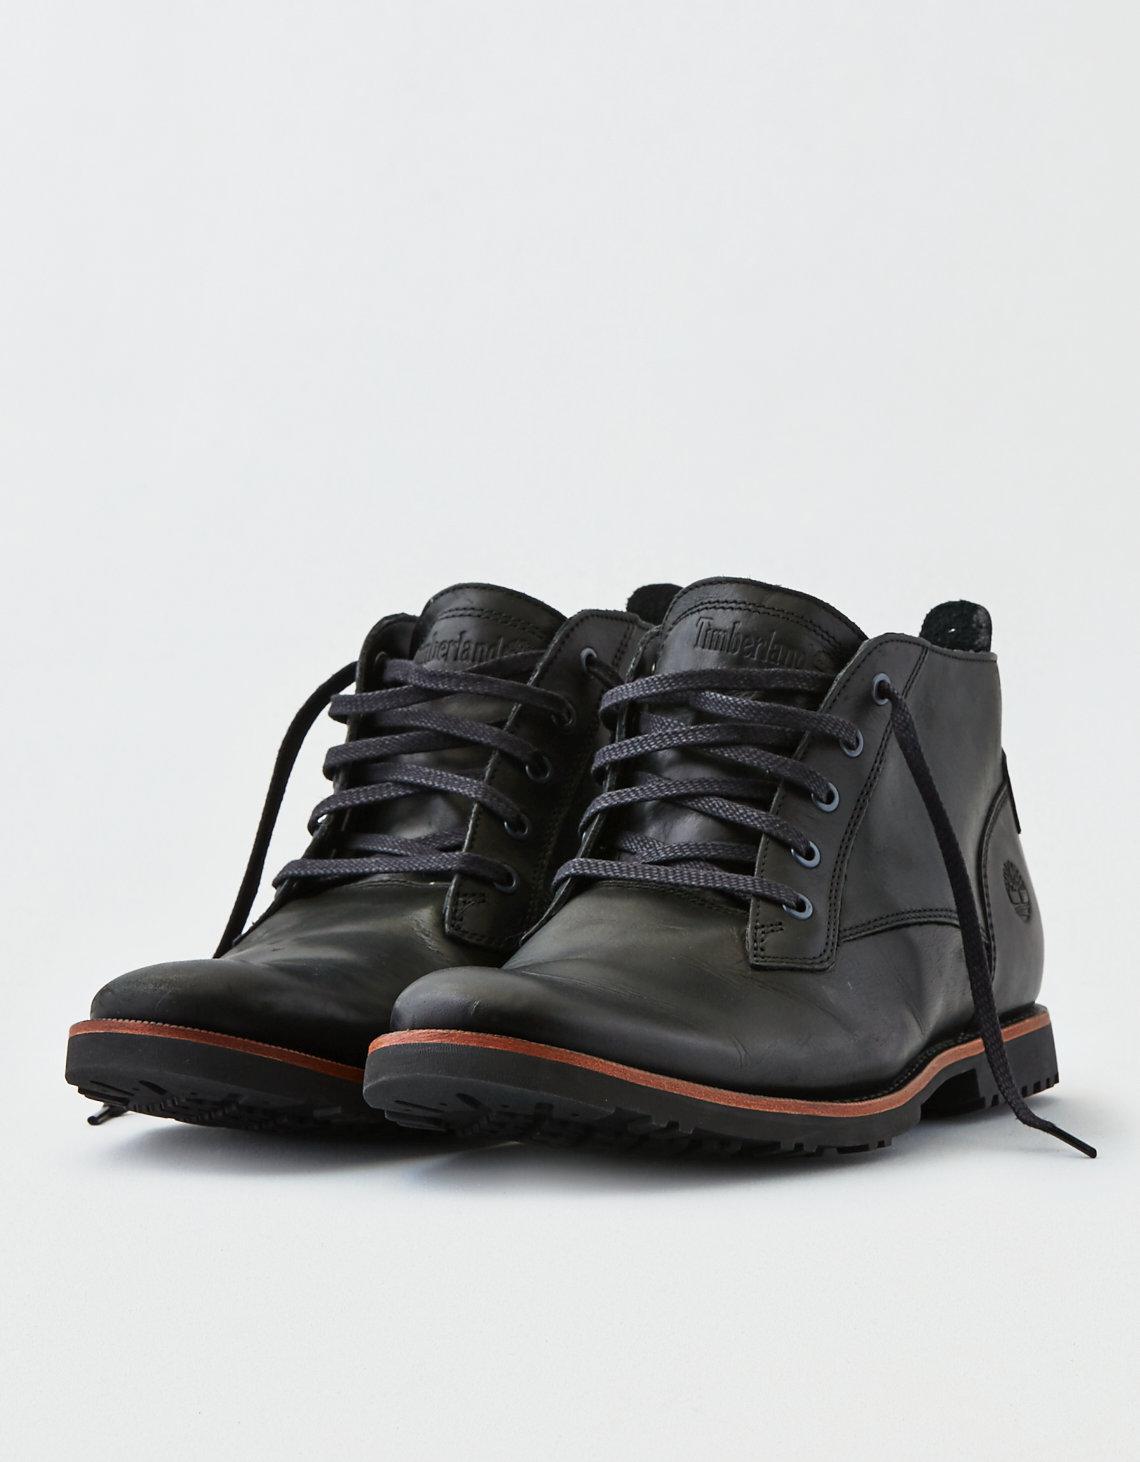 6a3cf67b460 American Eagle Black Timberland Kendrick Chukka Boot for men